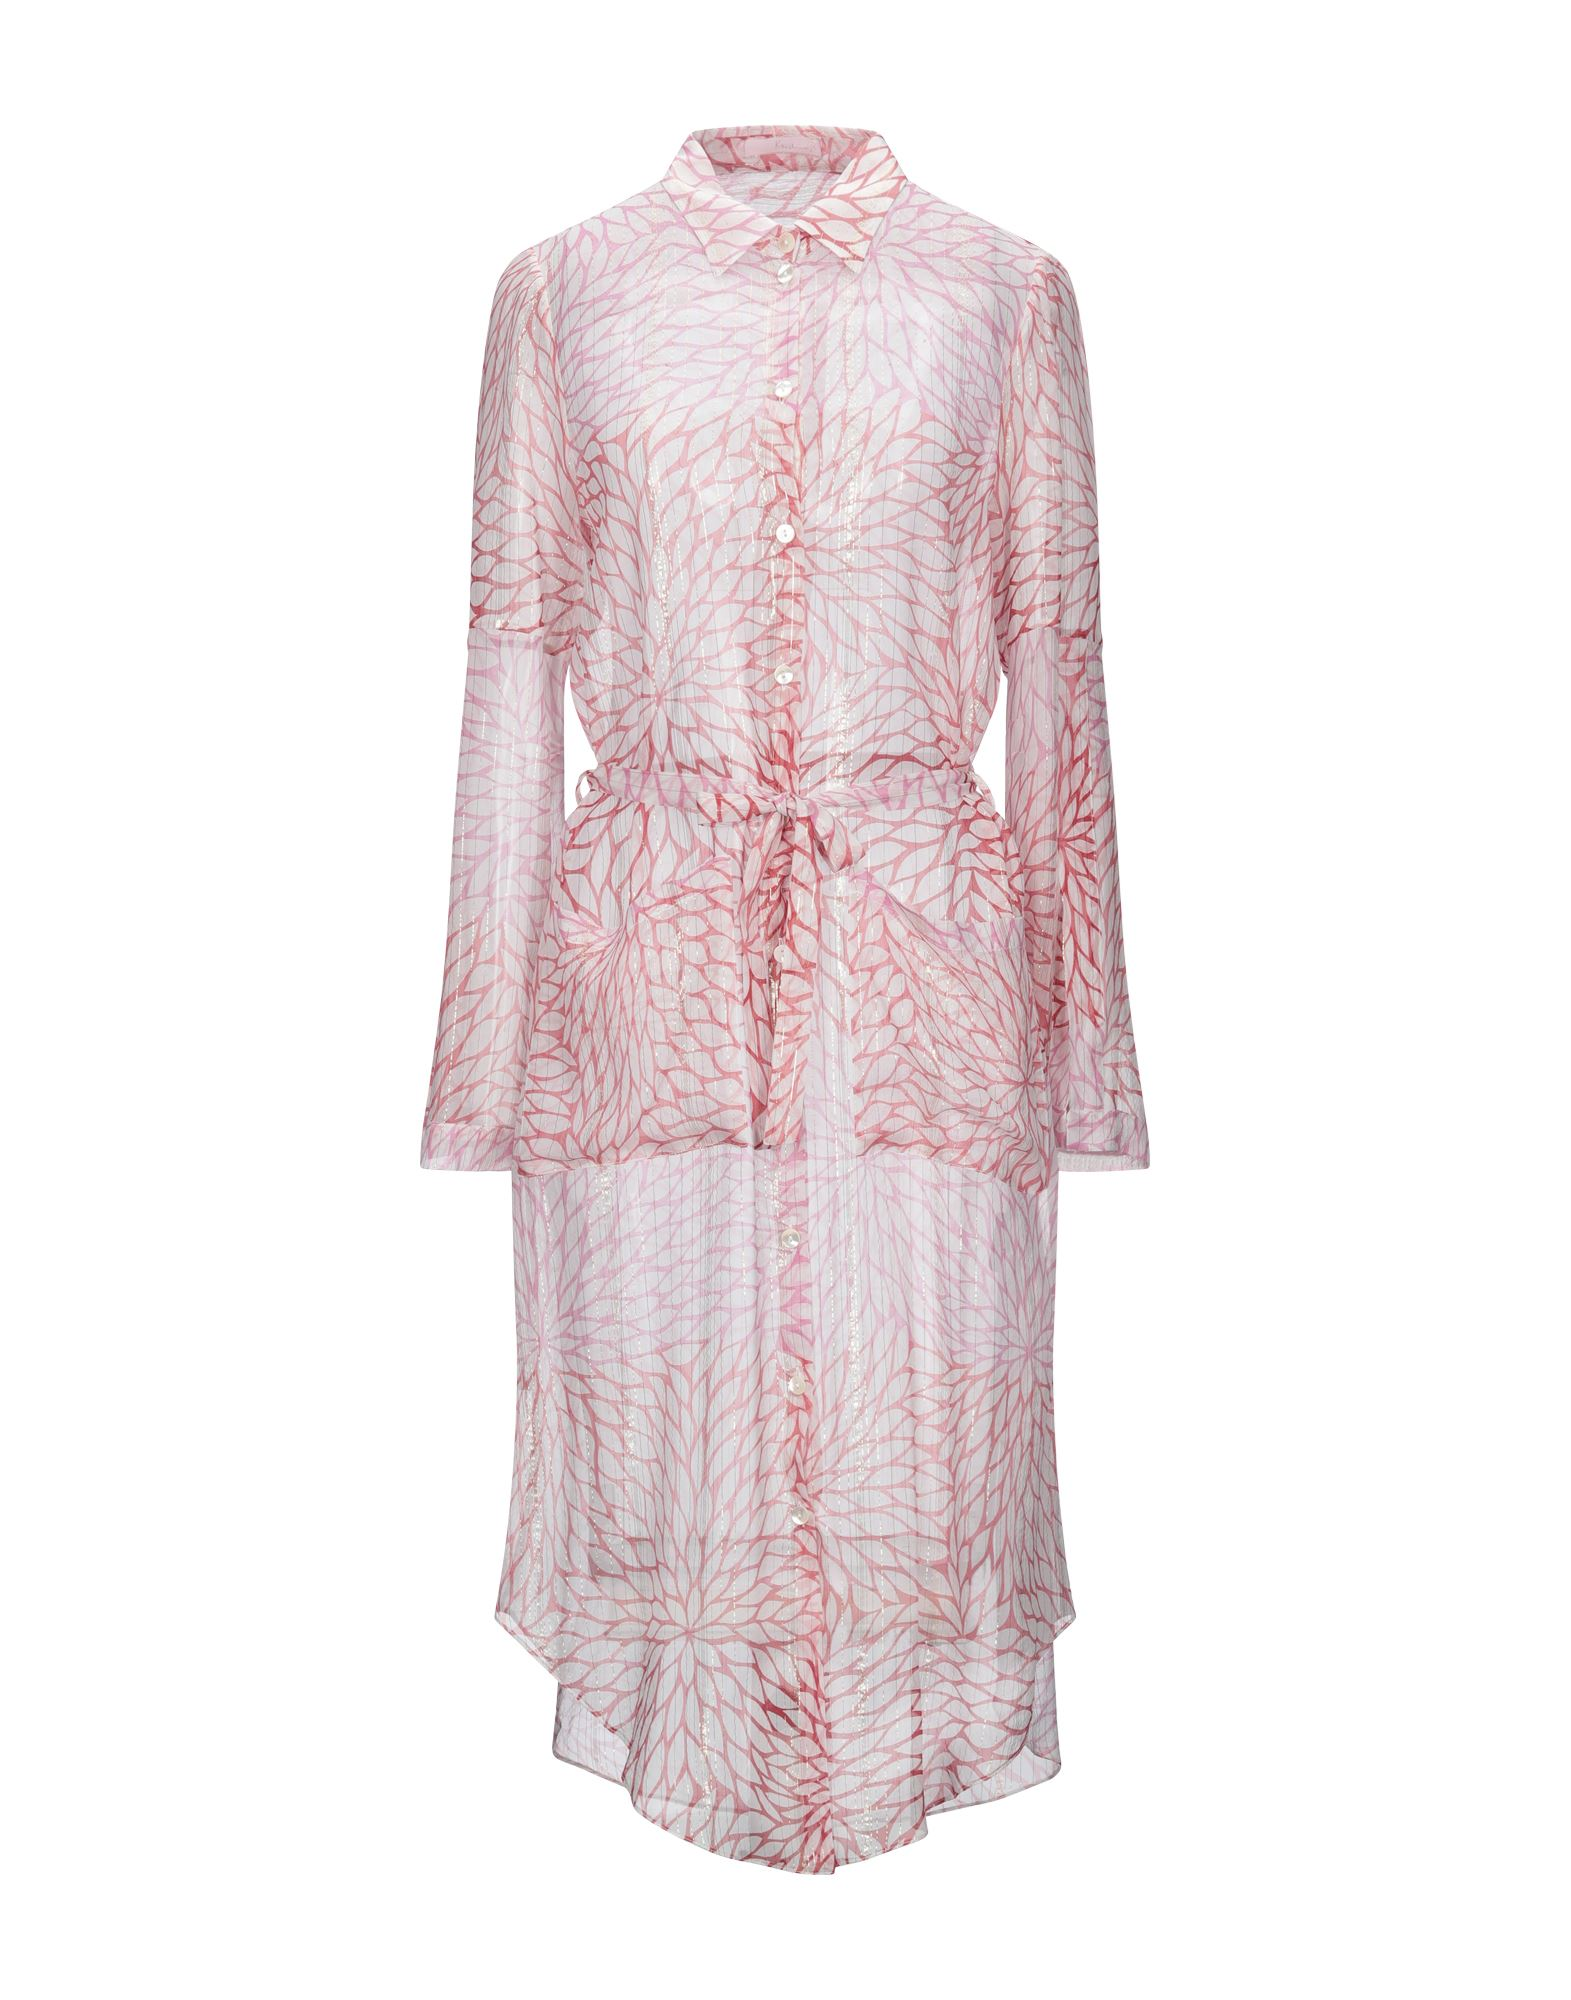 Фото - KRISTINA TI Платье длиной 3/4 kristina ti блузка